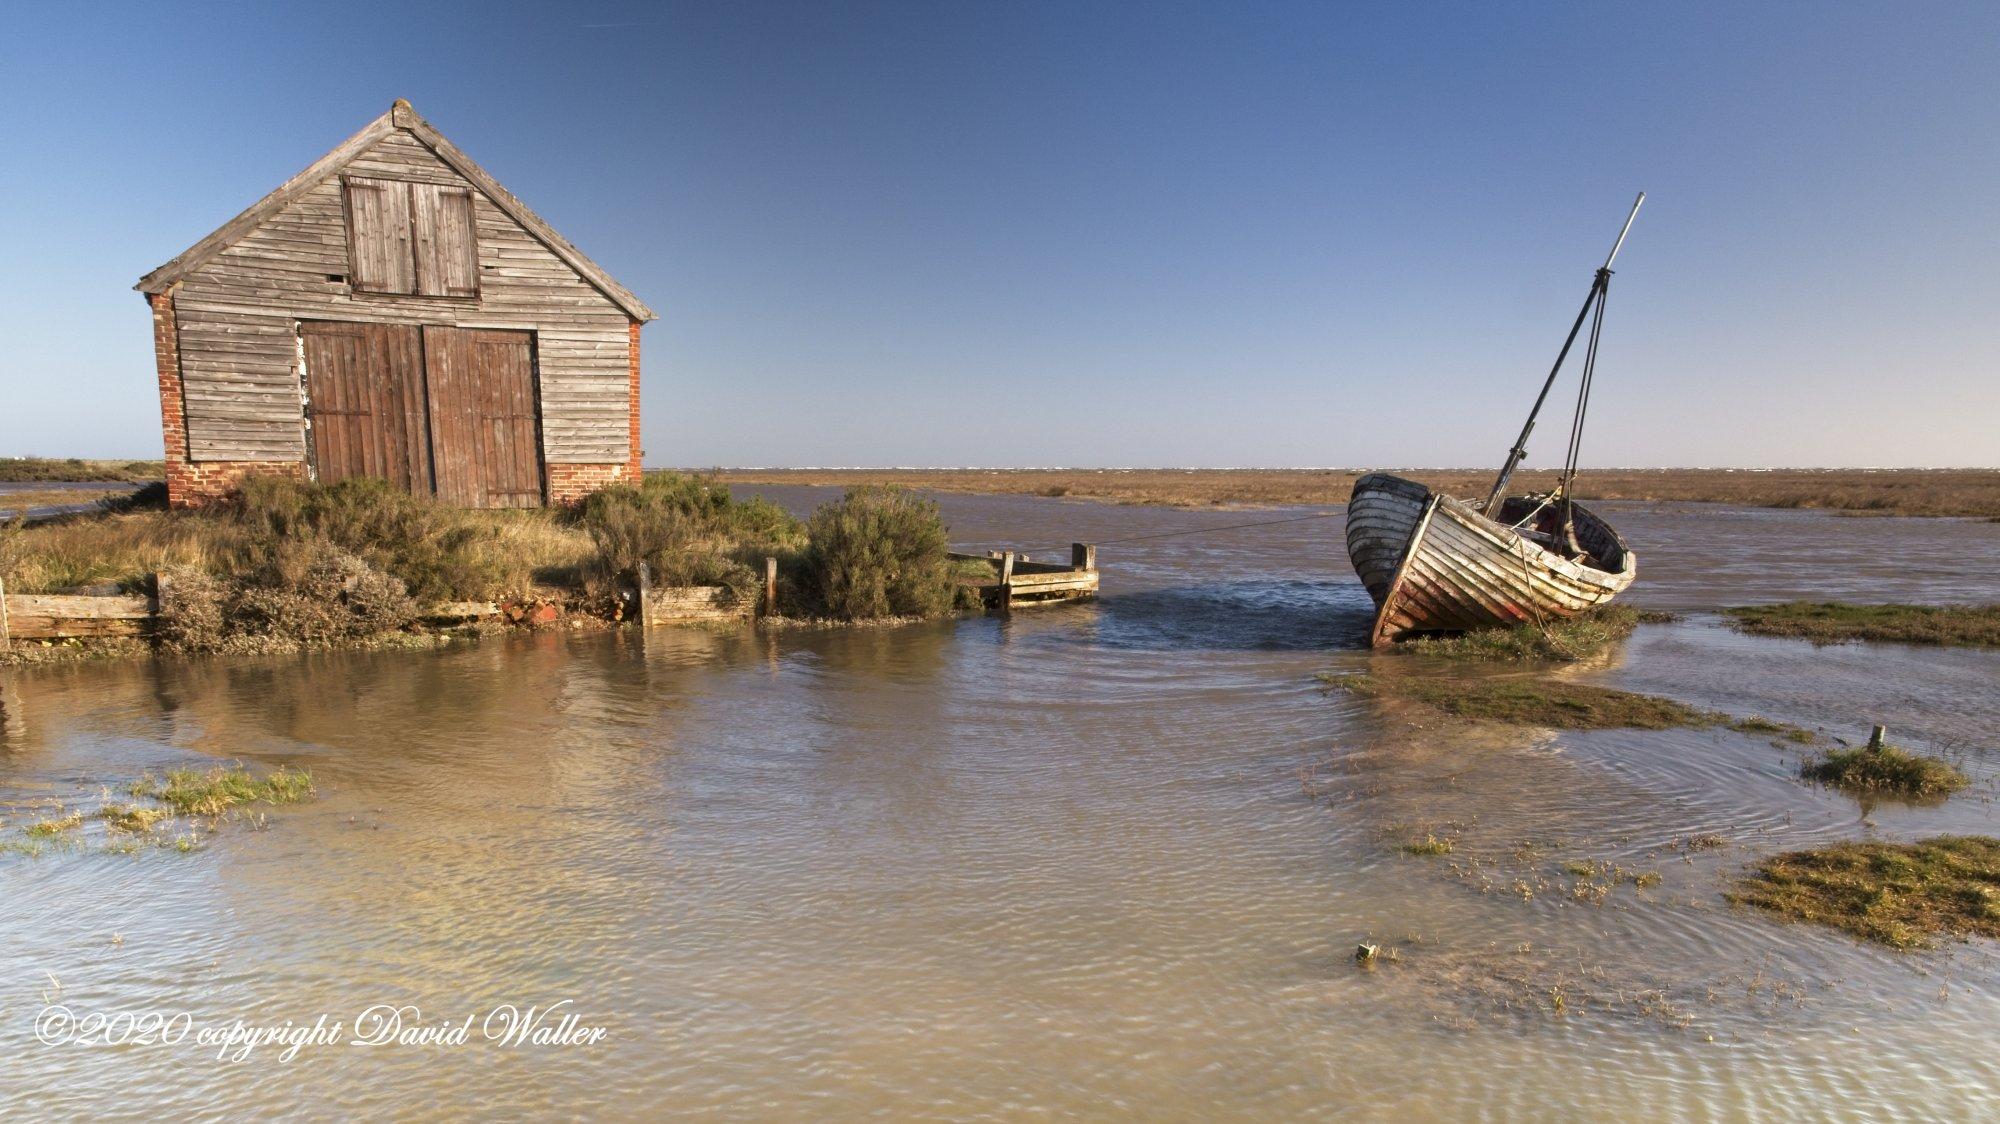 Thorham Boat shed